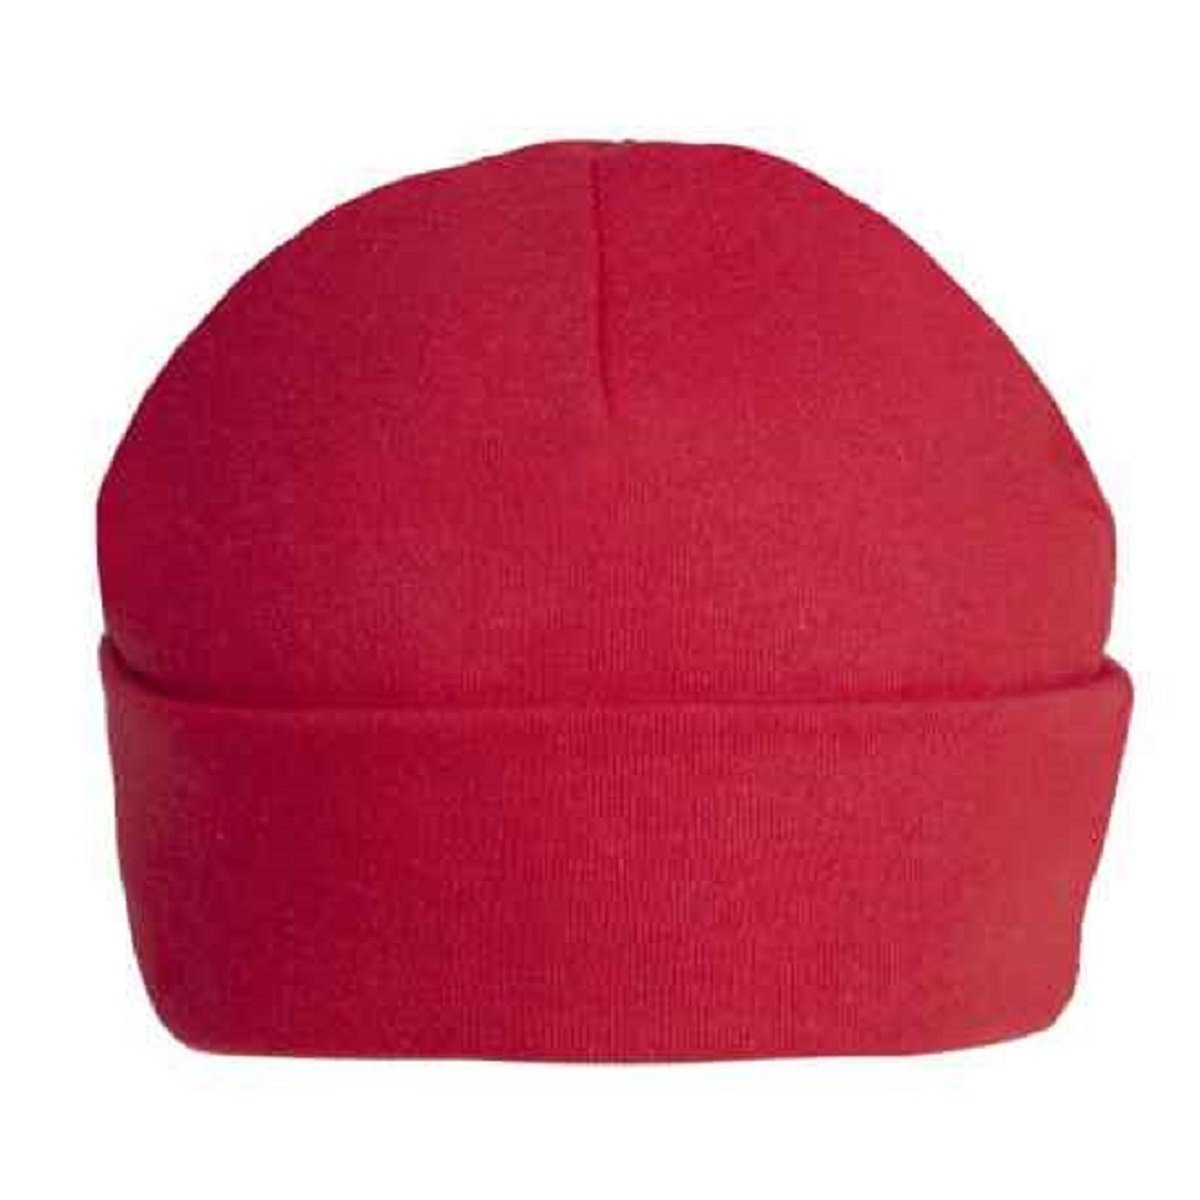 84b39dc92 Red Beanie Hat